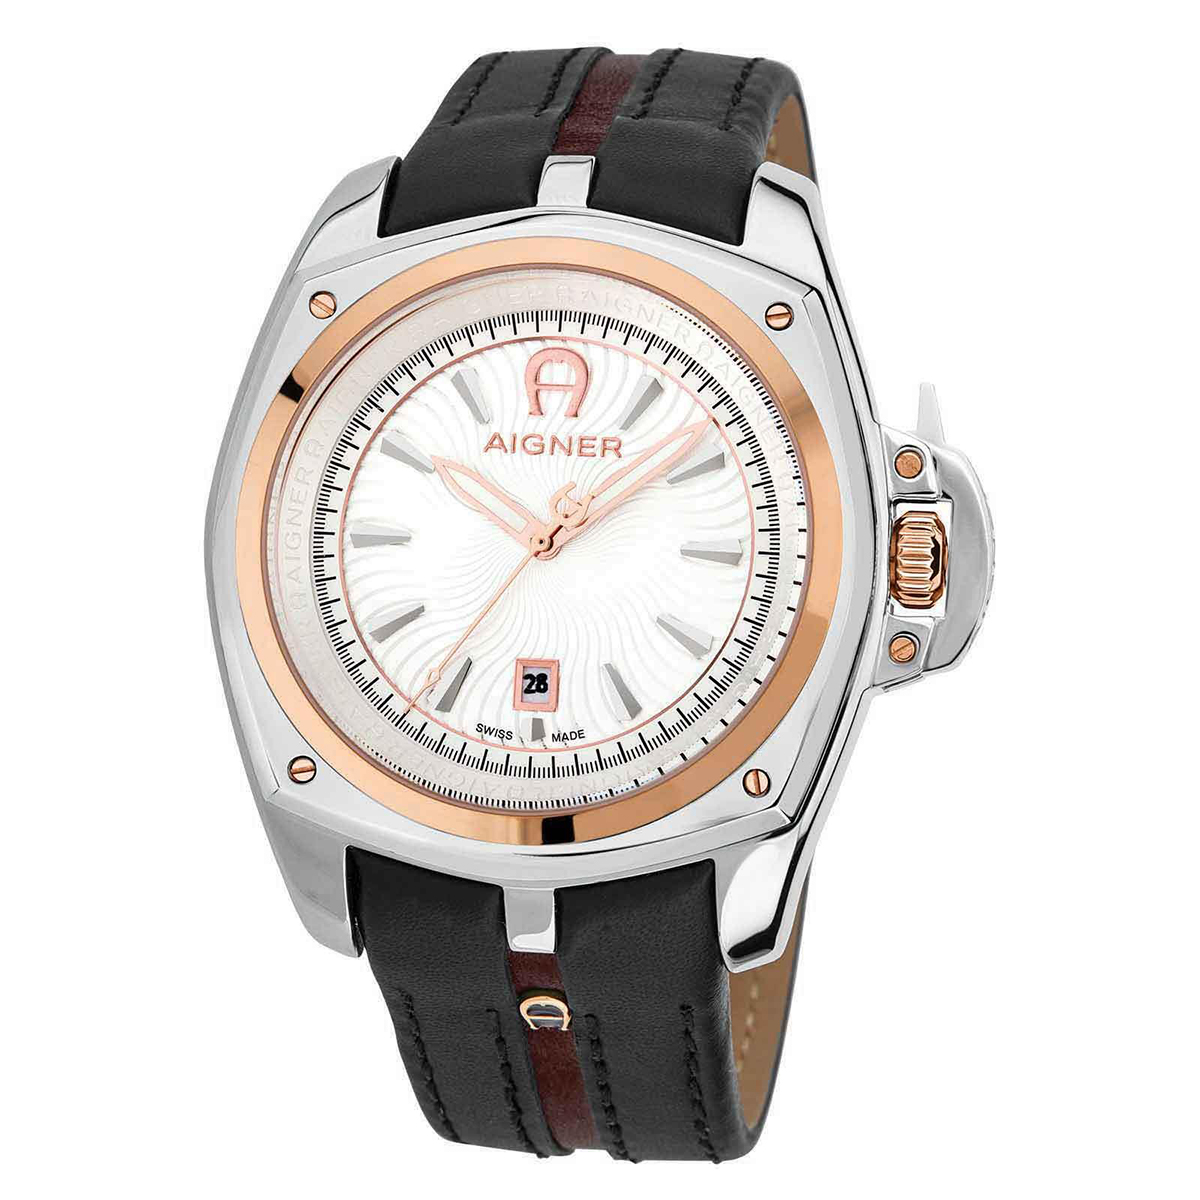 ساعت مچی عقربه ای مردانه اگنر مدل A18128 26